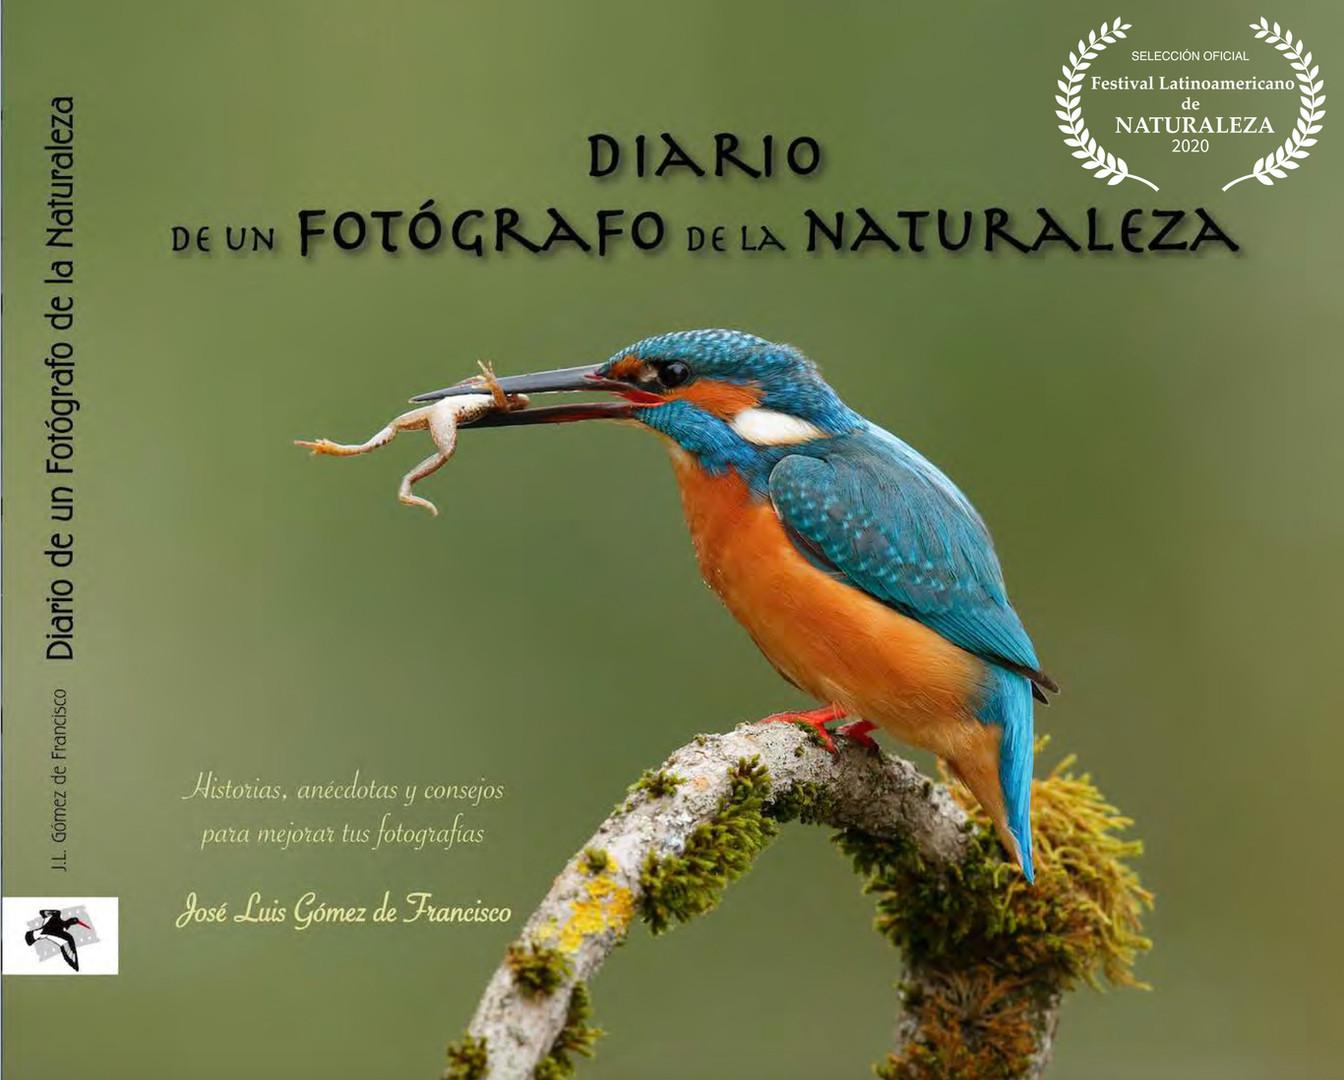 Diario de un Fotografo de la Naturaleza